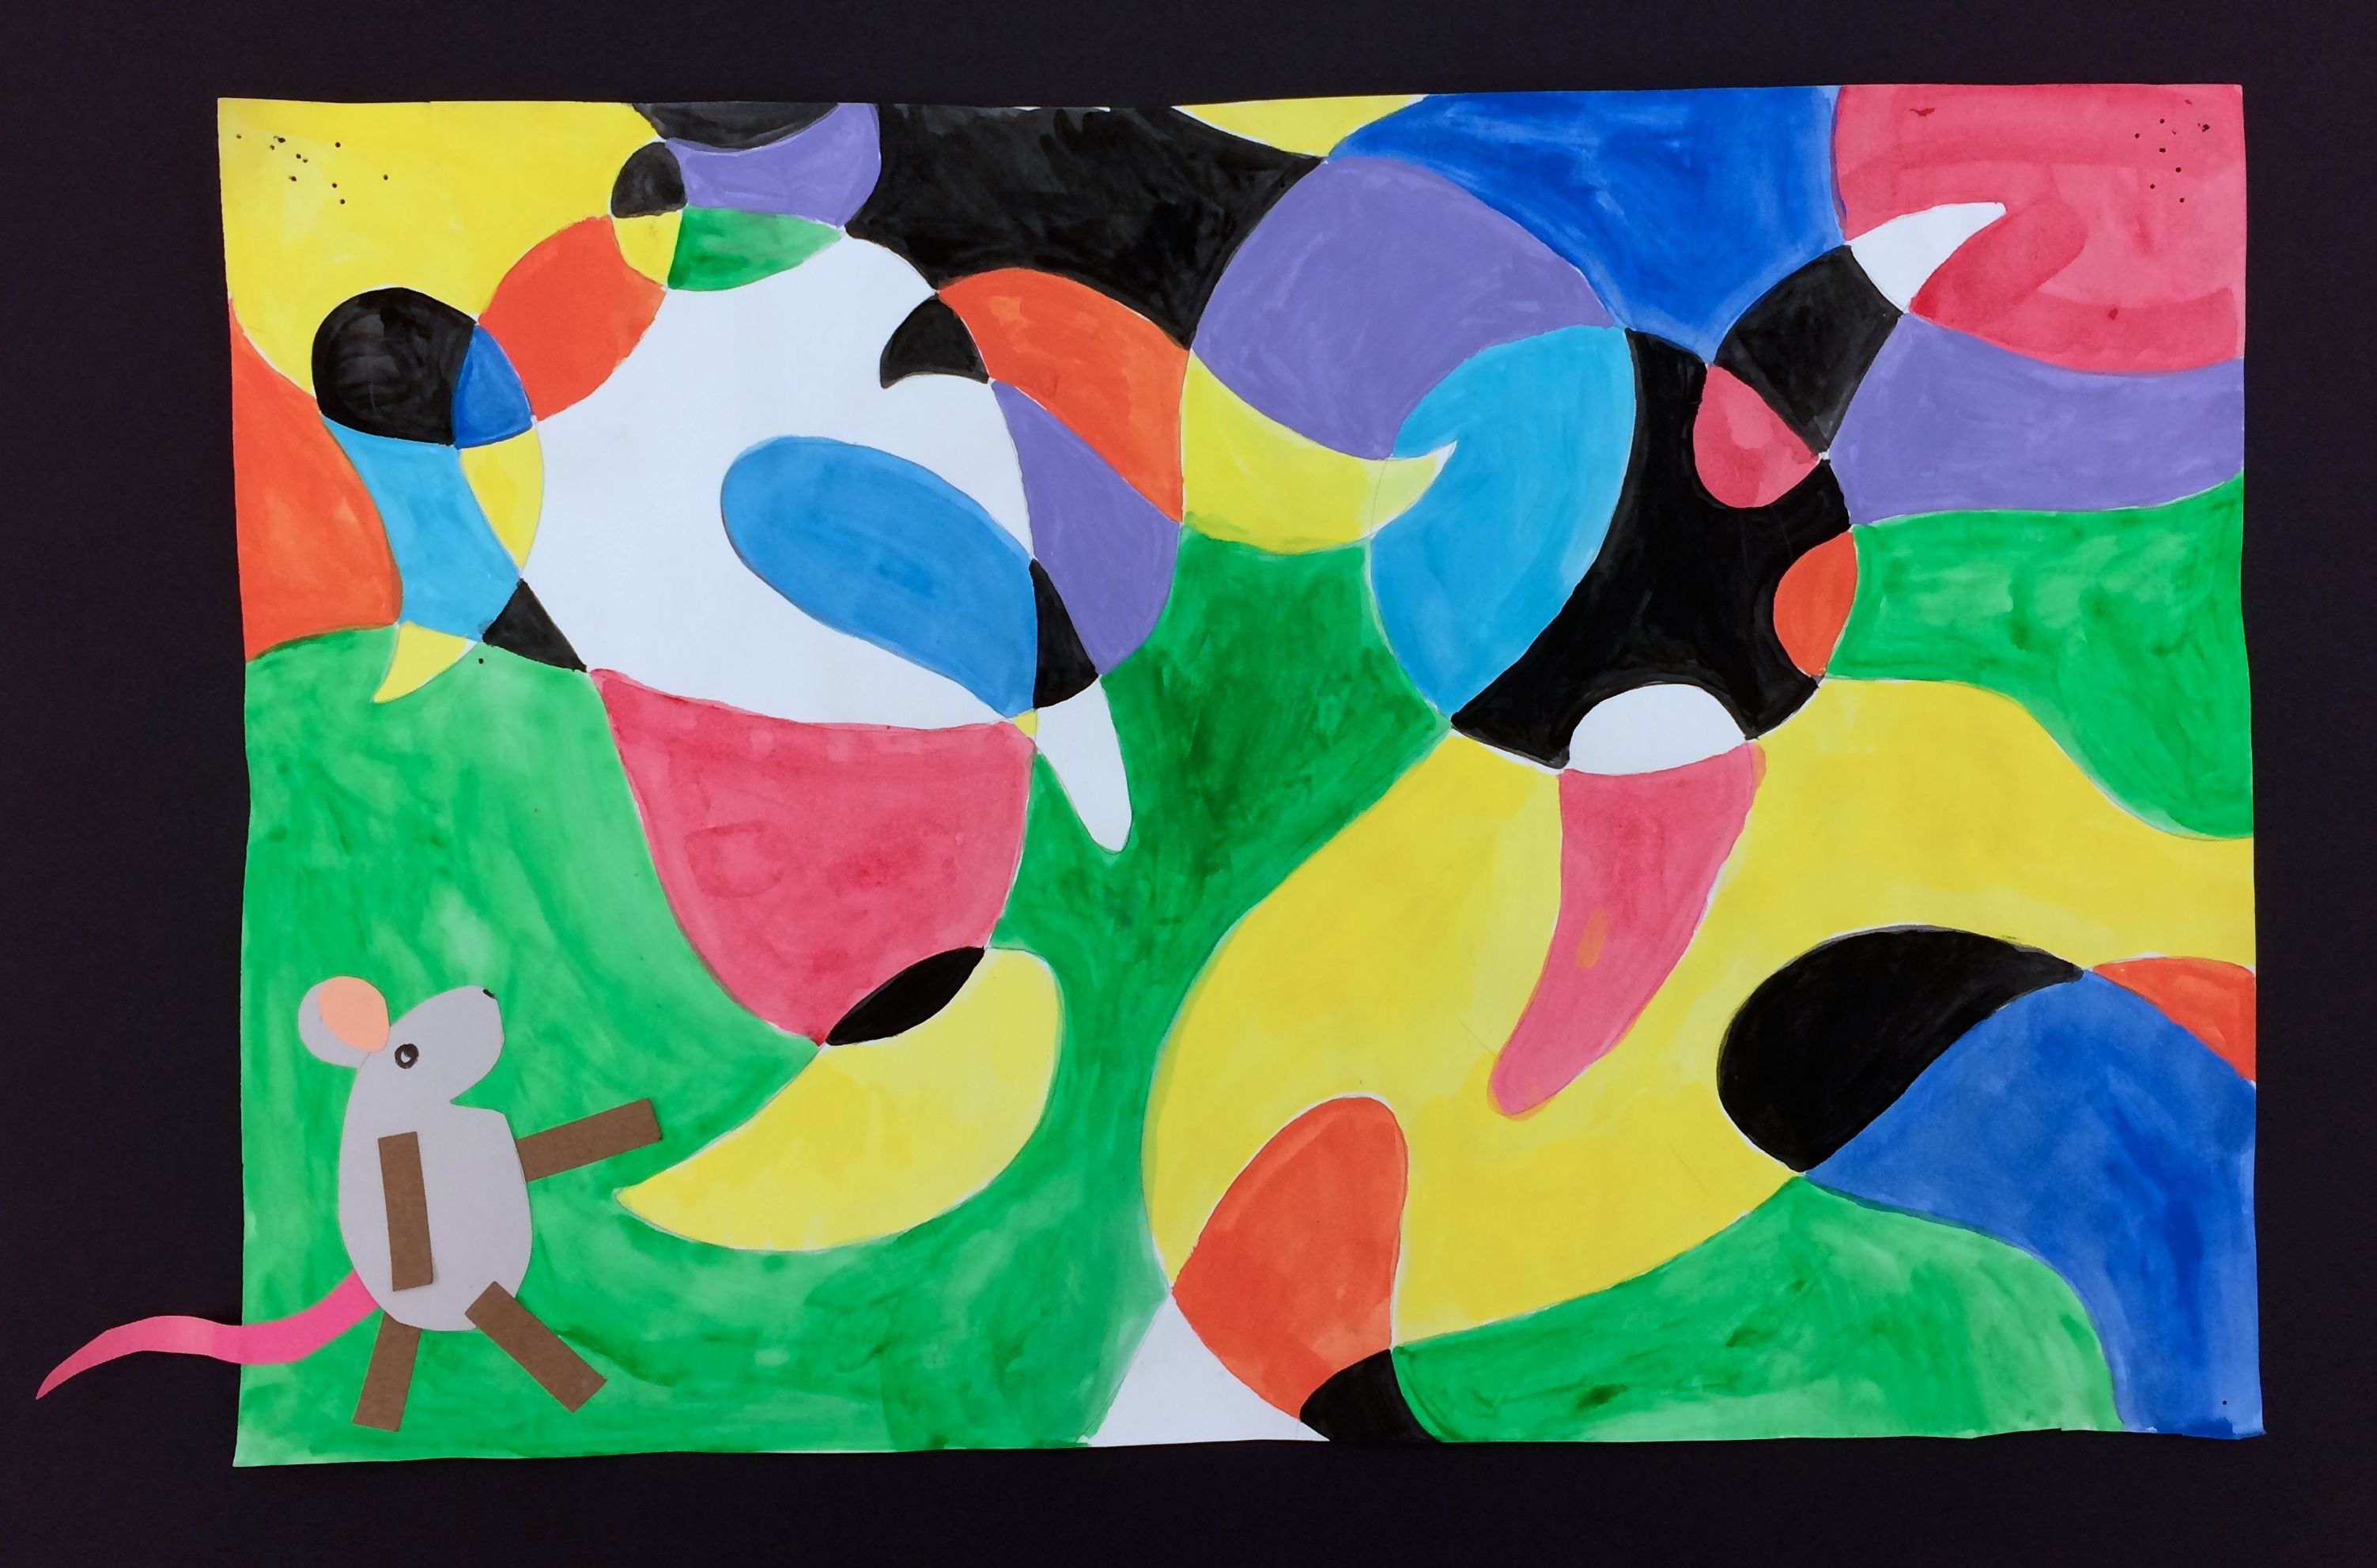 Matthew' Dream Abstract Art Painting Grade Project